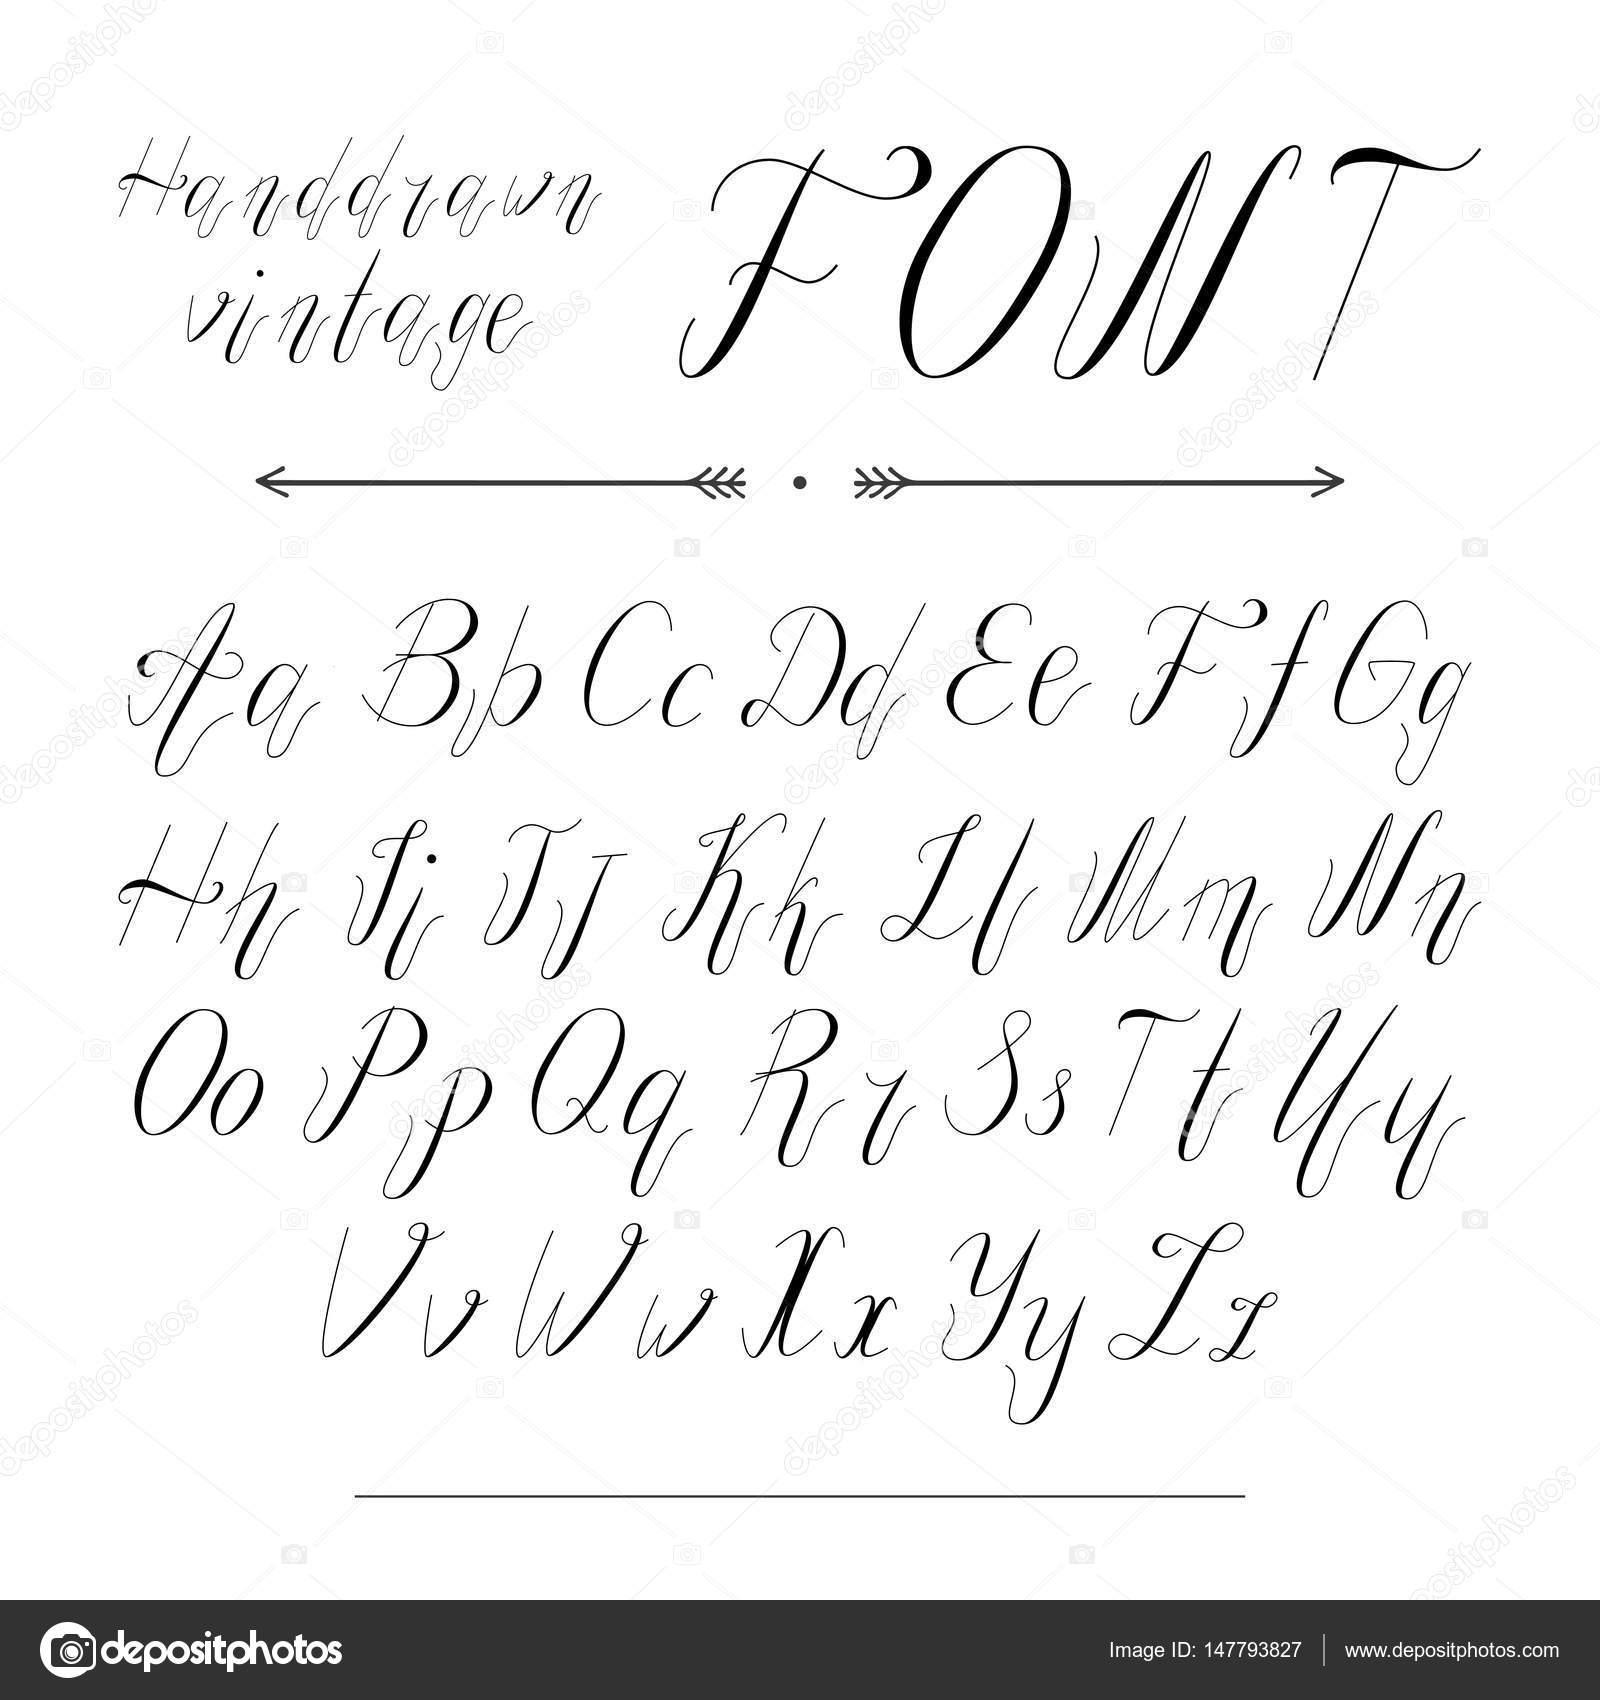 El Yazısı Harfler Yazı Tipi Alfabe Stok Vektör Stasyspecial